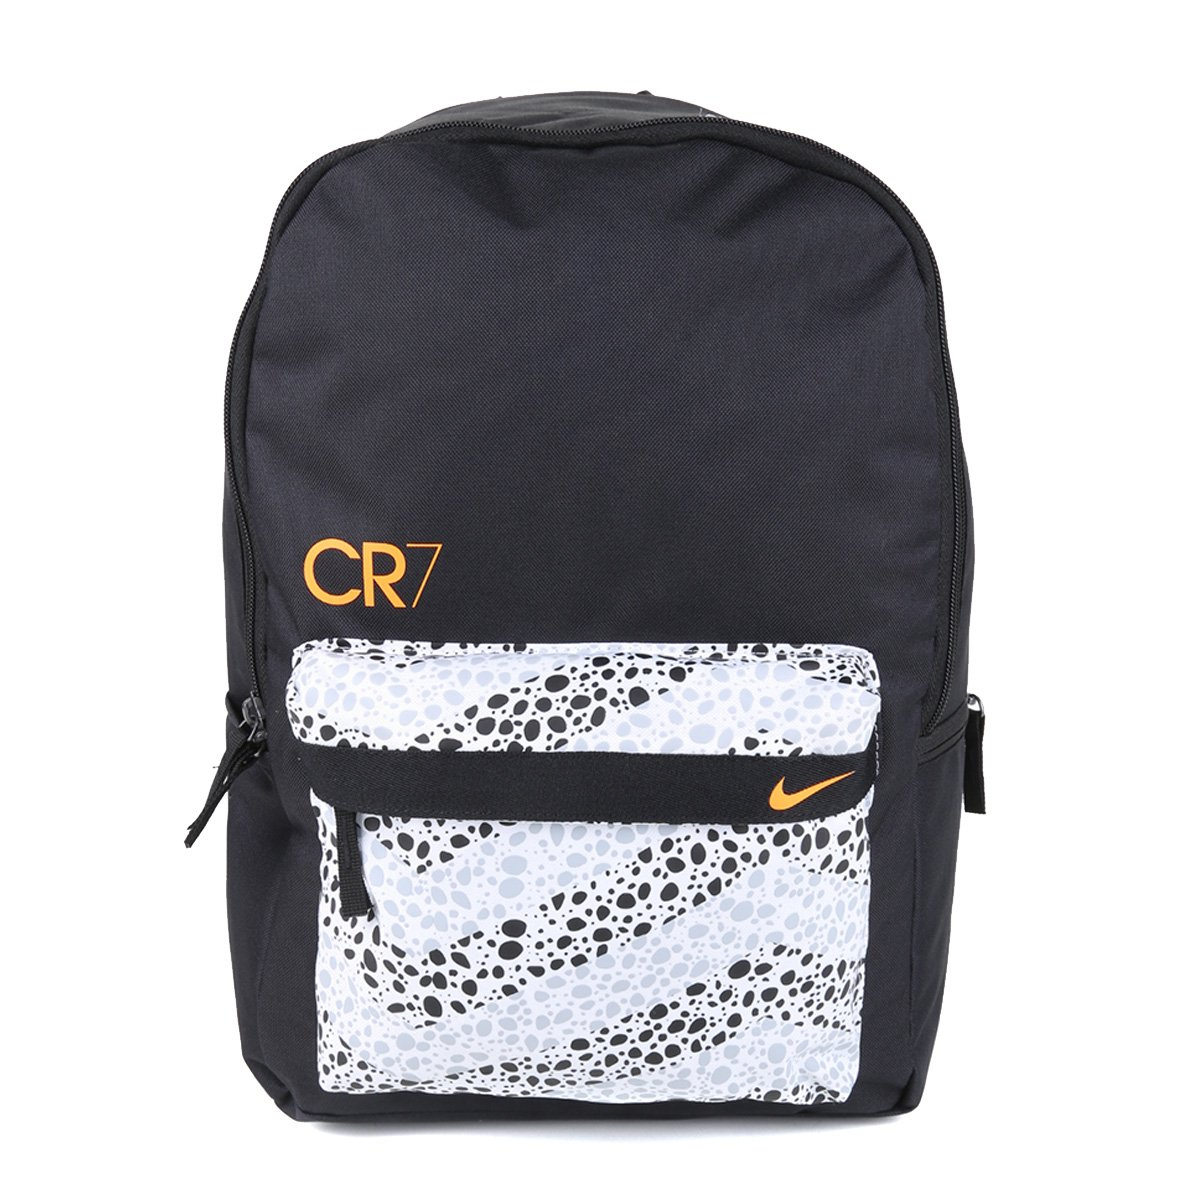 Mochila Juvenil Nike CR7 FA20